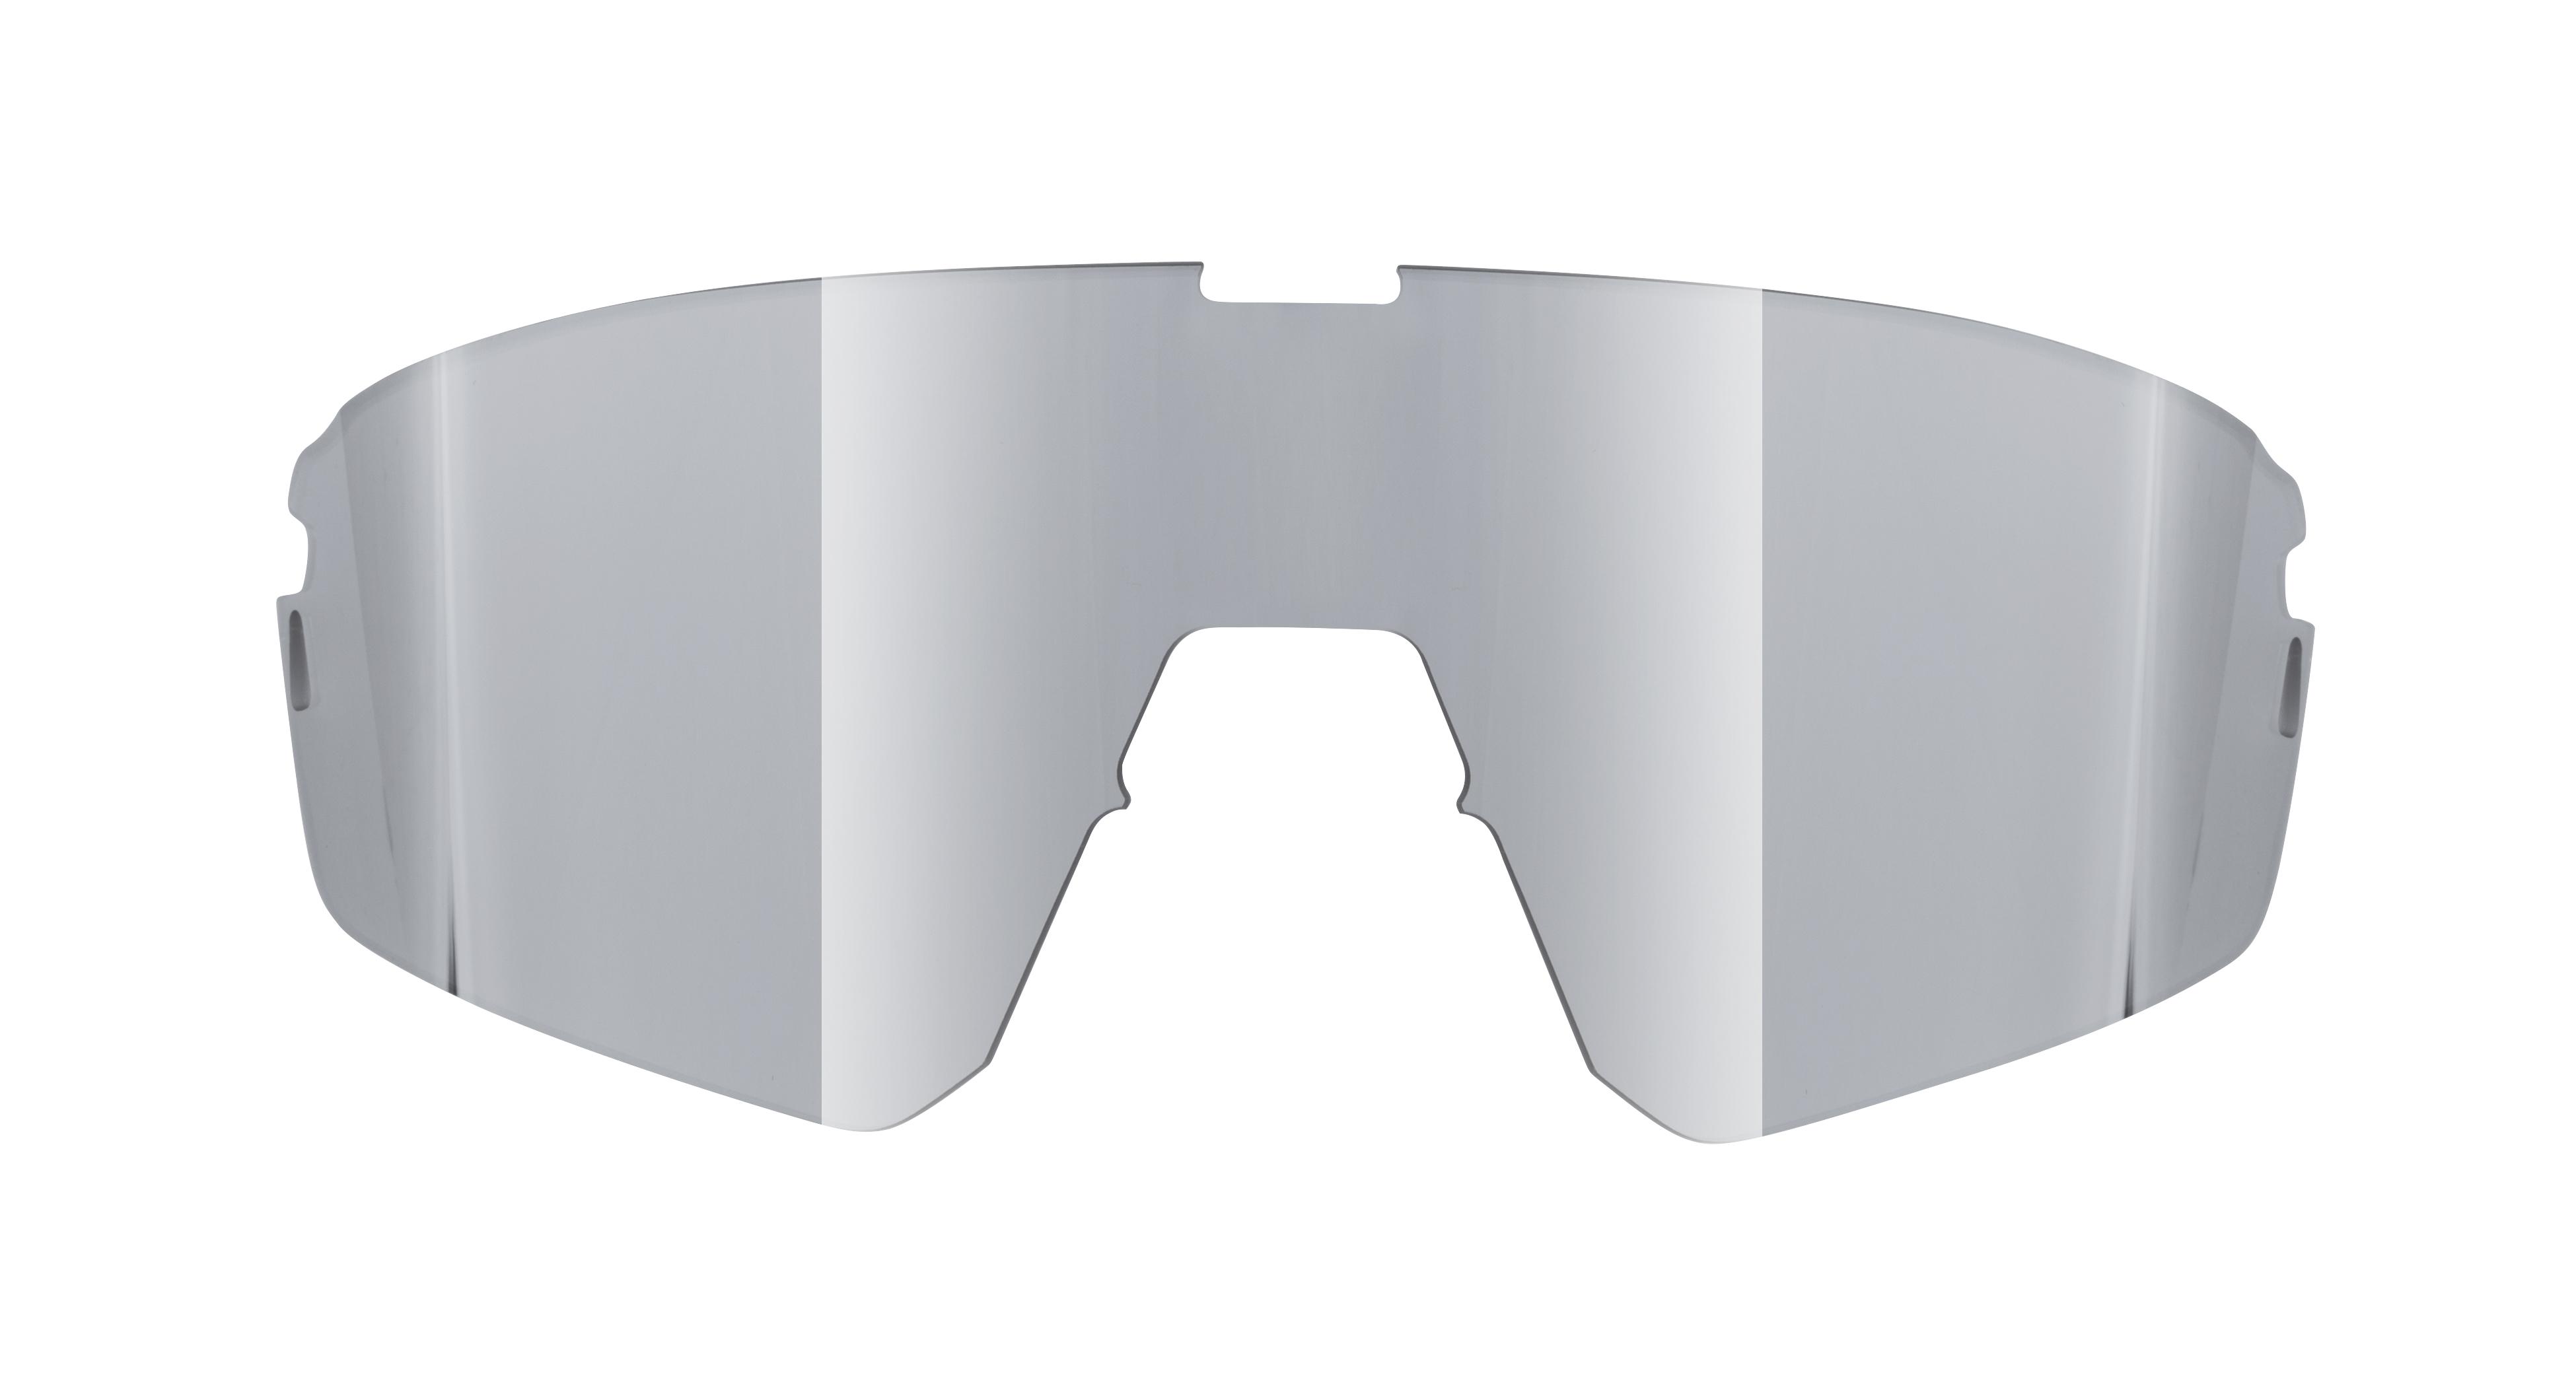 sklo náhradní FORCE APEX, zrcadlové stříbrné